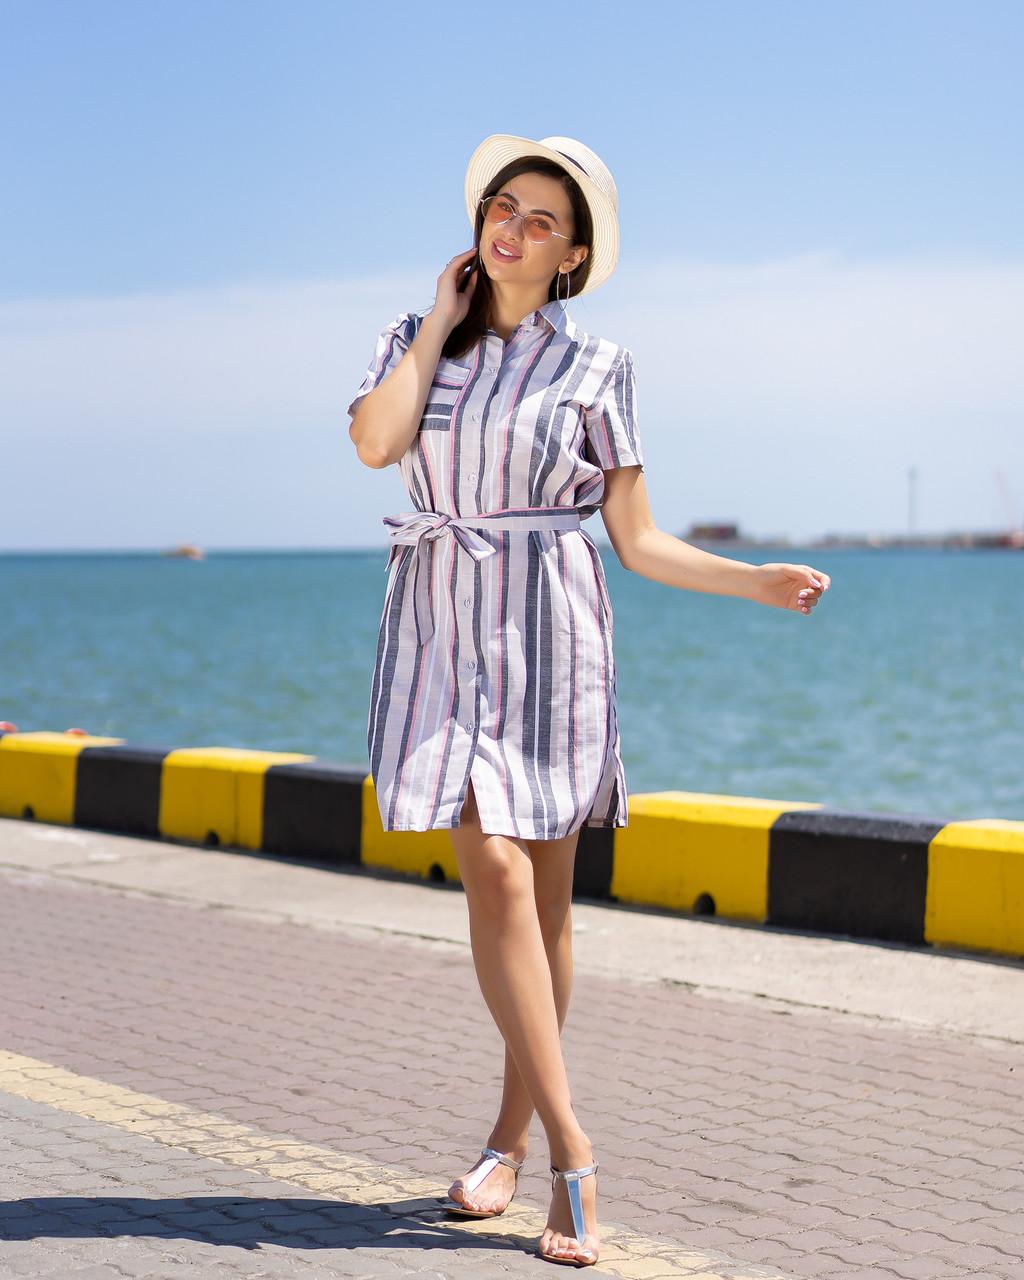 Платье-рубашка всине-розовую  полоску  от YuLiYa Chumachenko